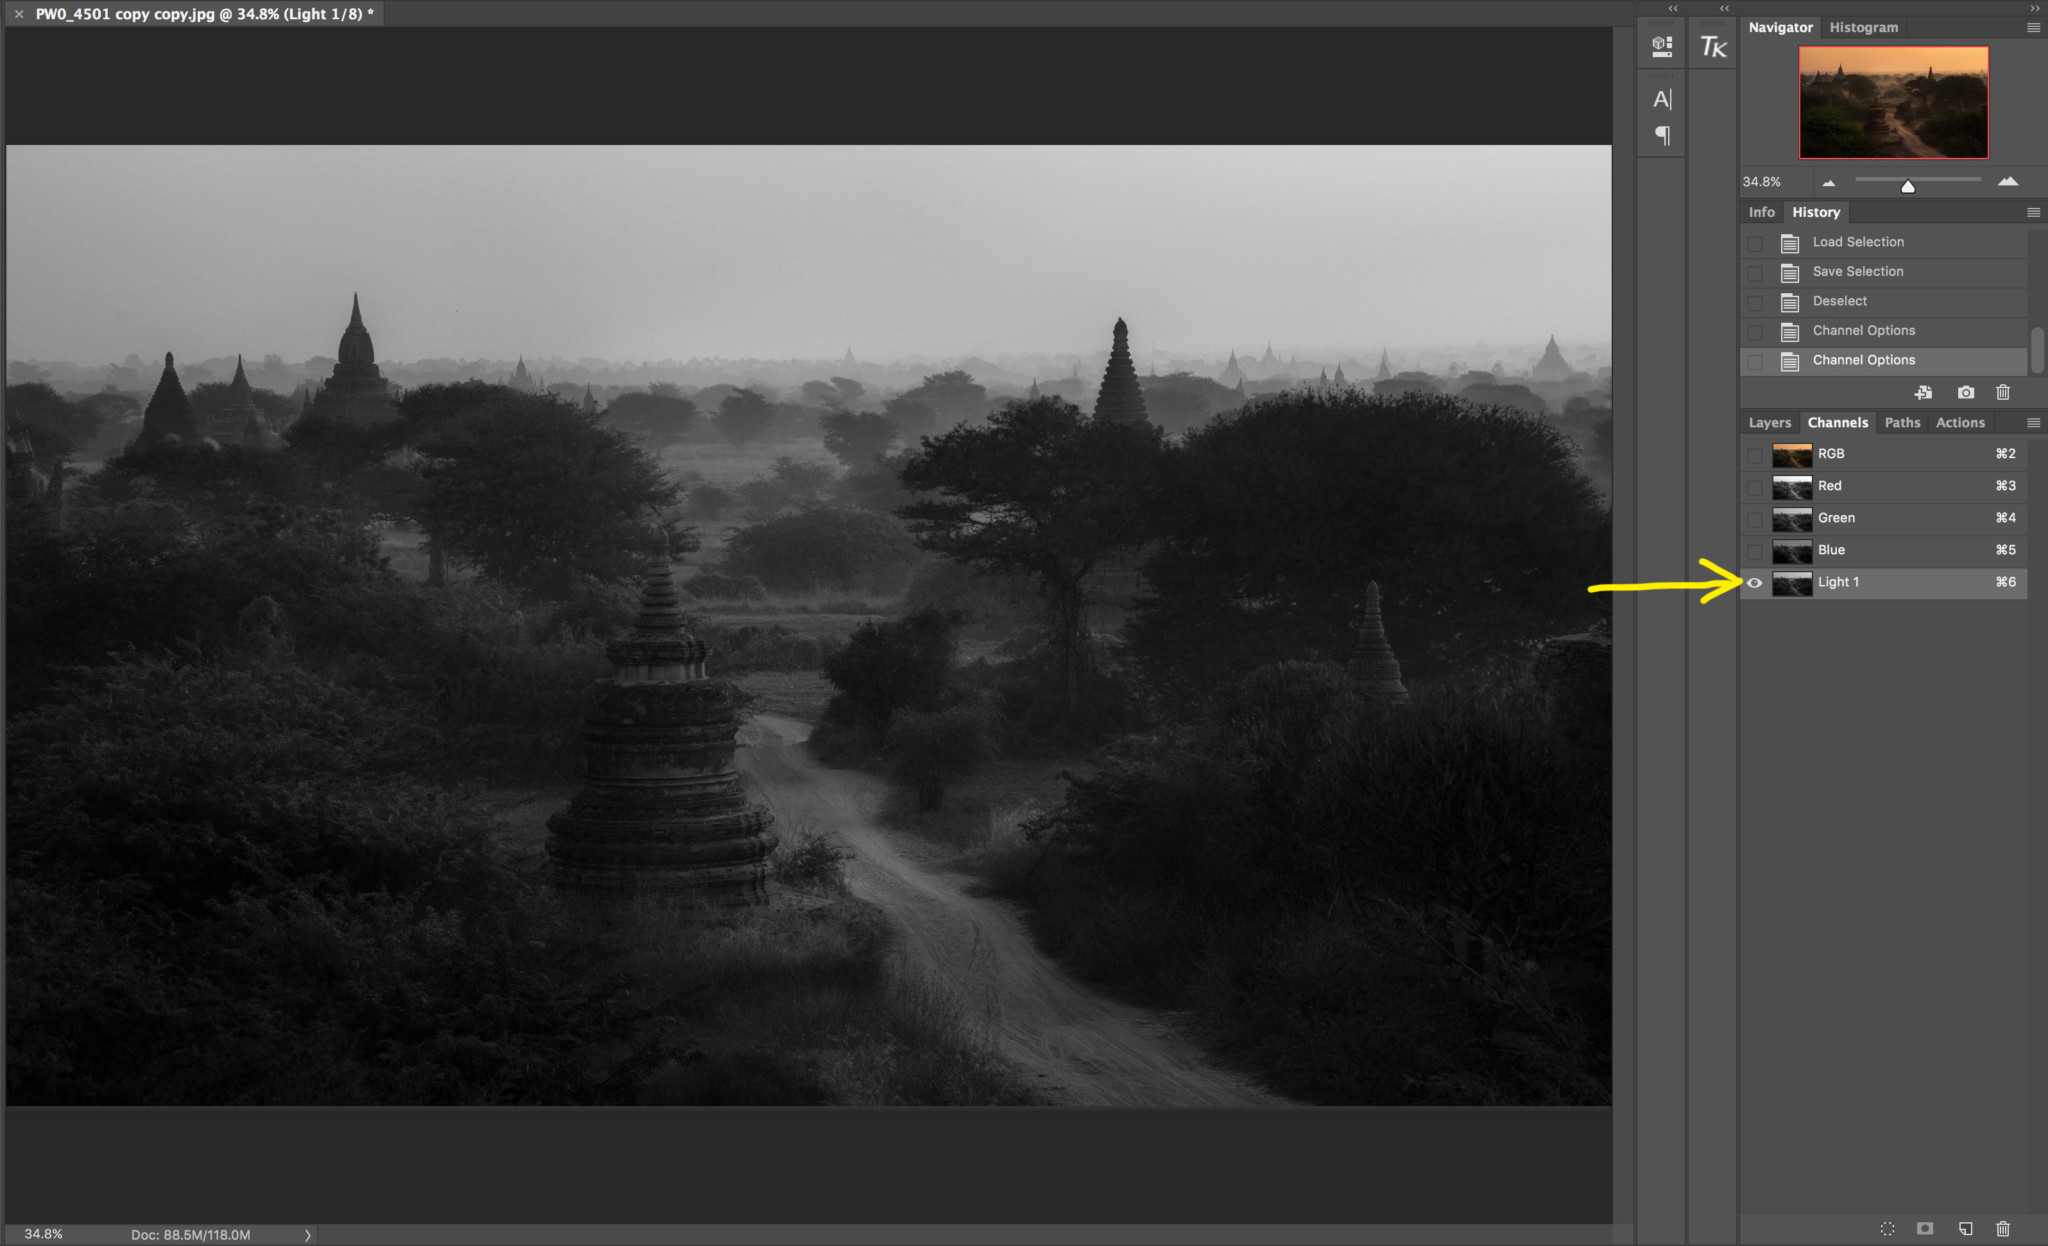 screenshot-2016-11-26-12-08-25